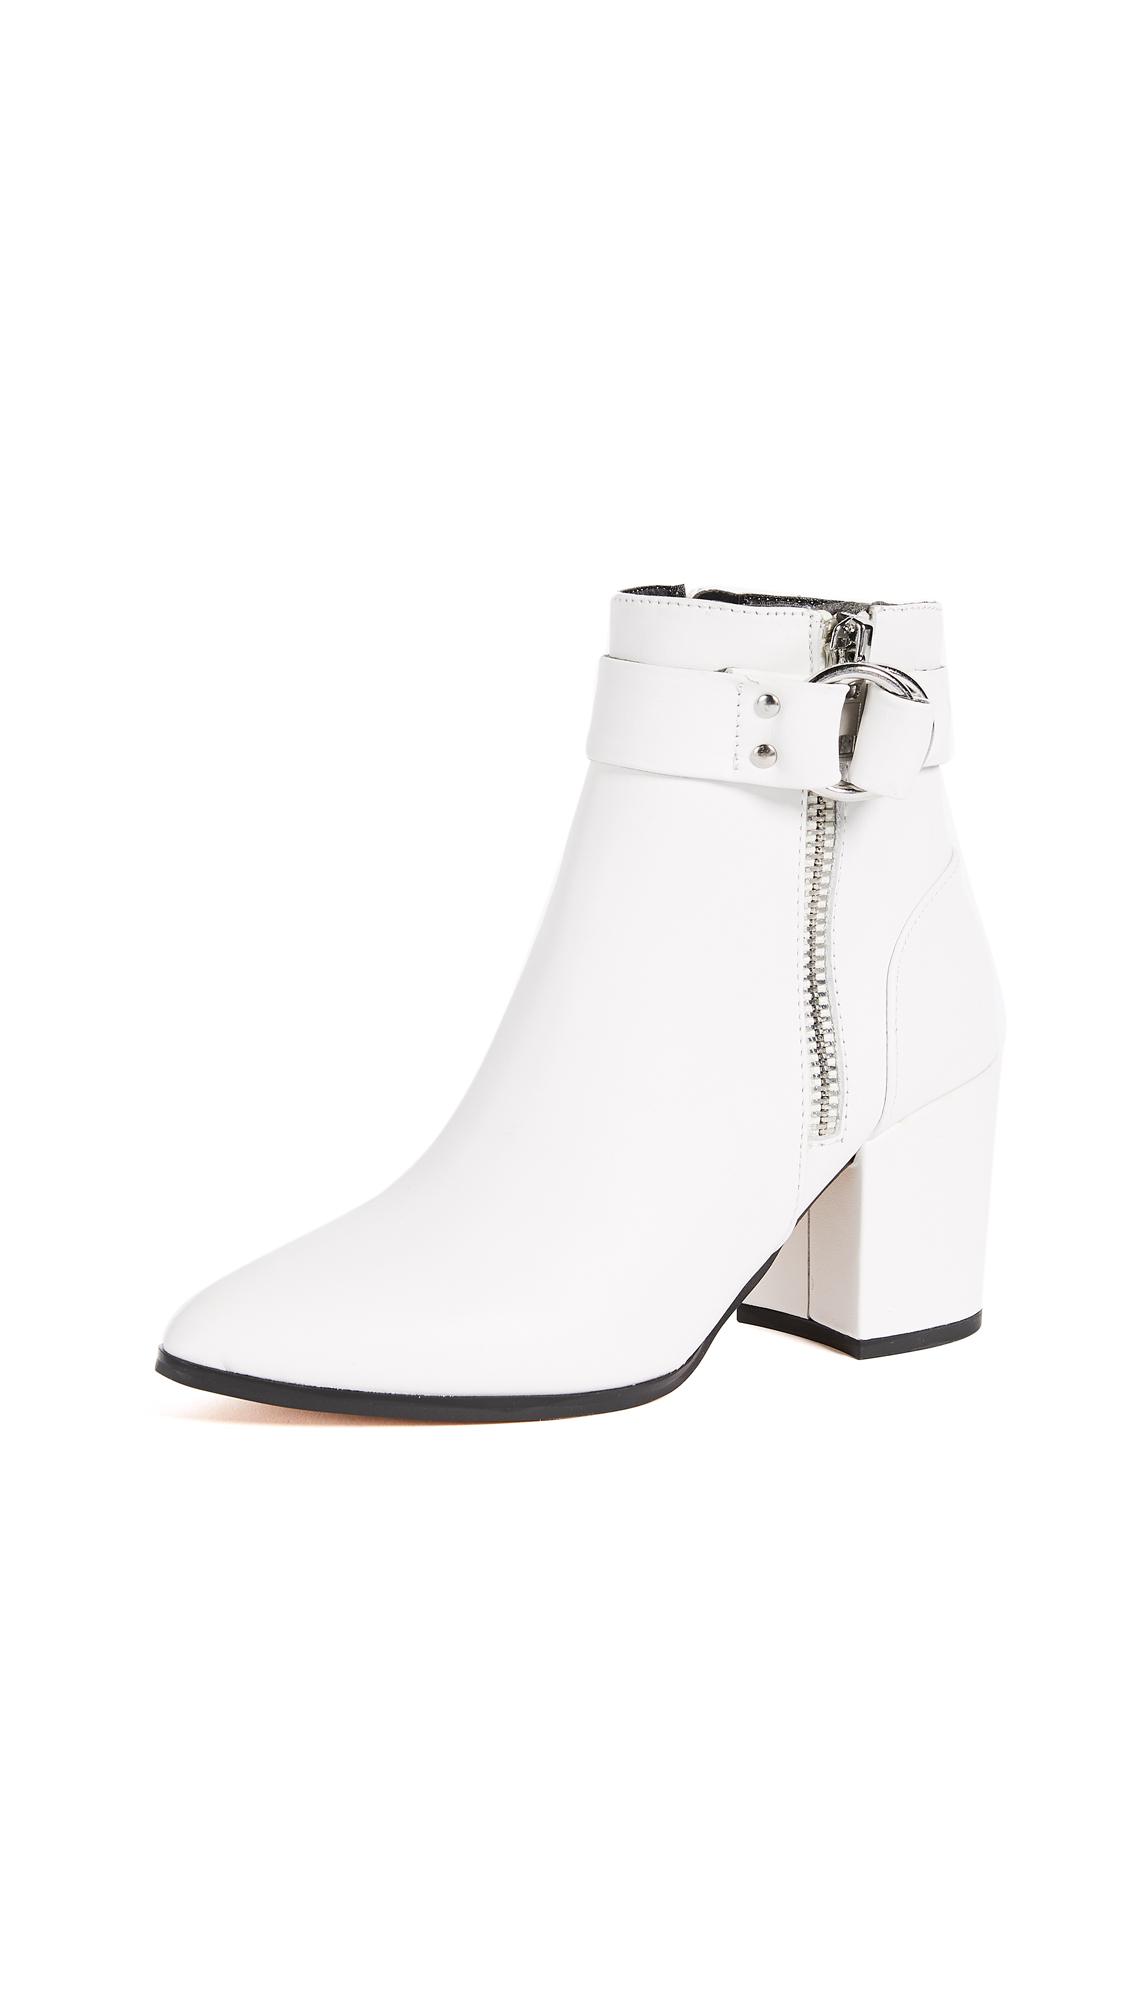 Steven Johanna Block Heel Ankle Boots - White